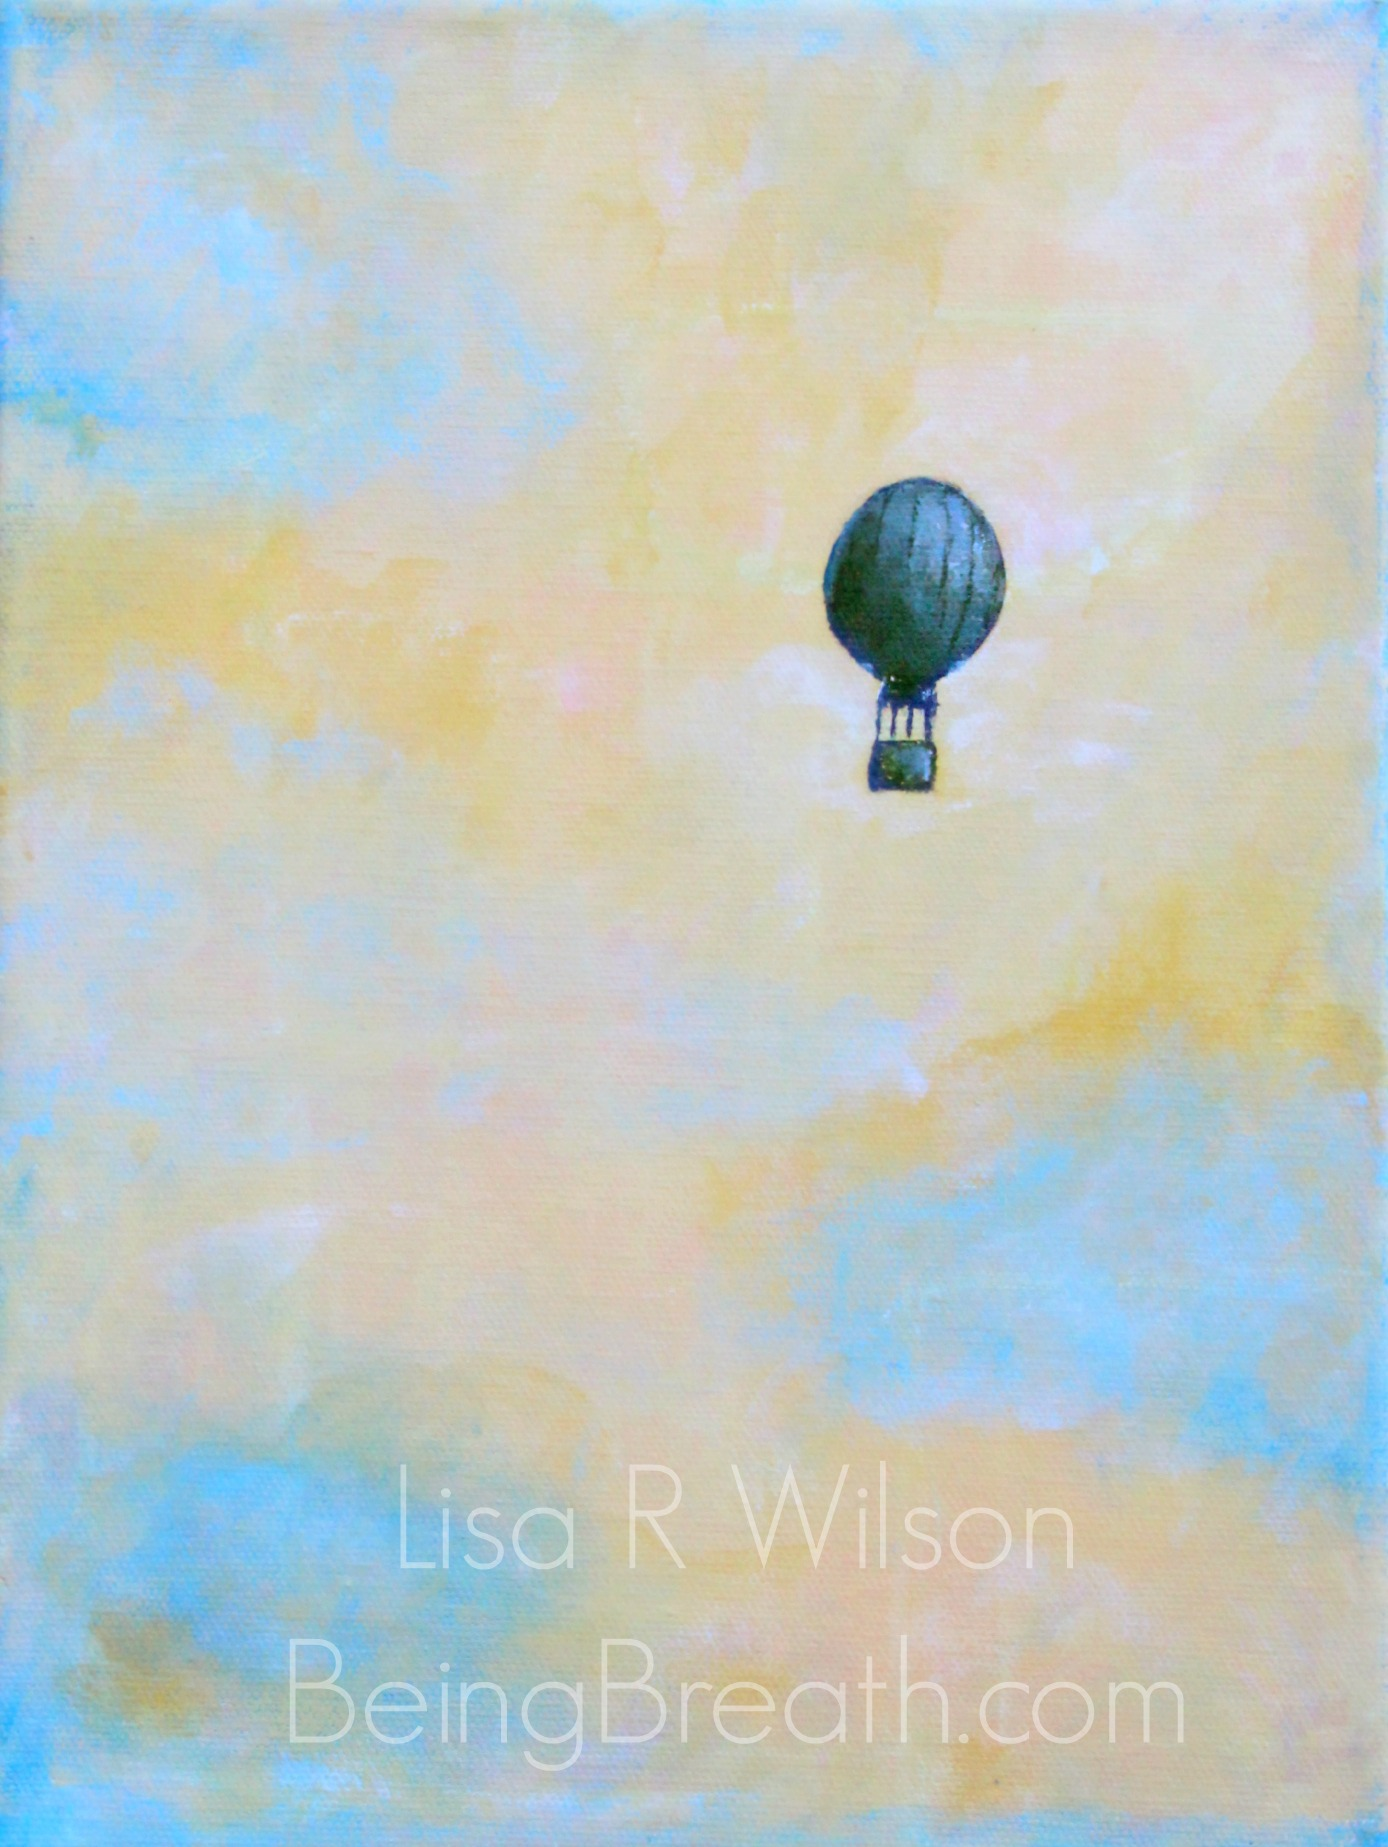 YOU ARE HERE - Lisa Renee Wilson, BeingBreath.com, WM.jpg